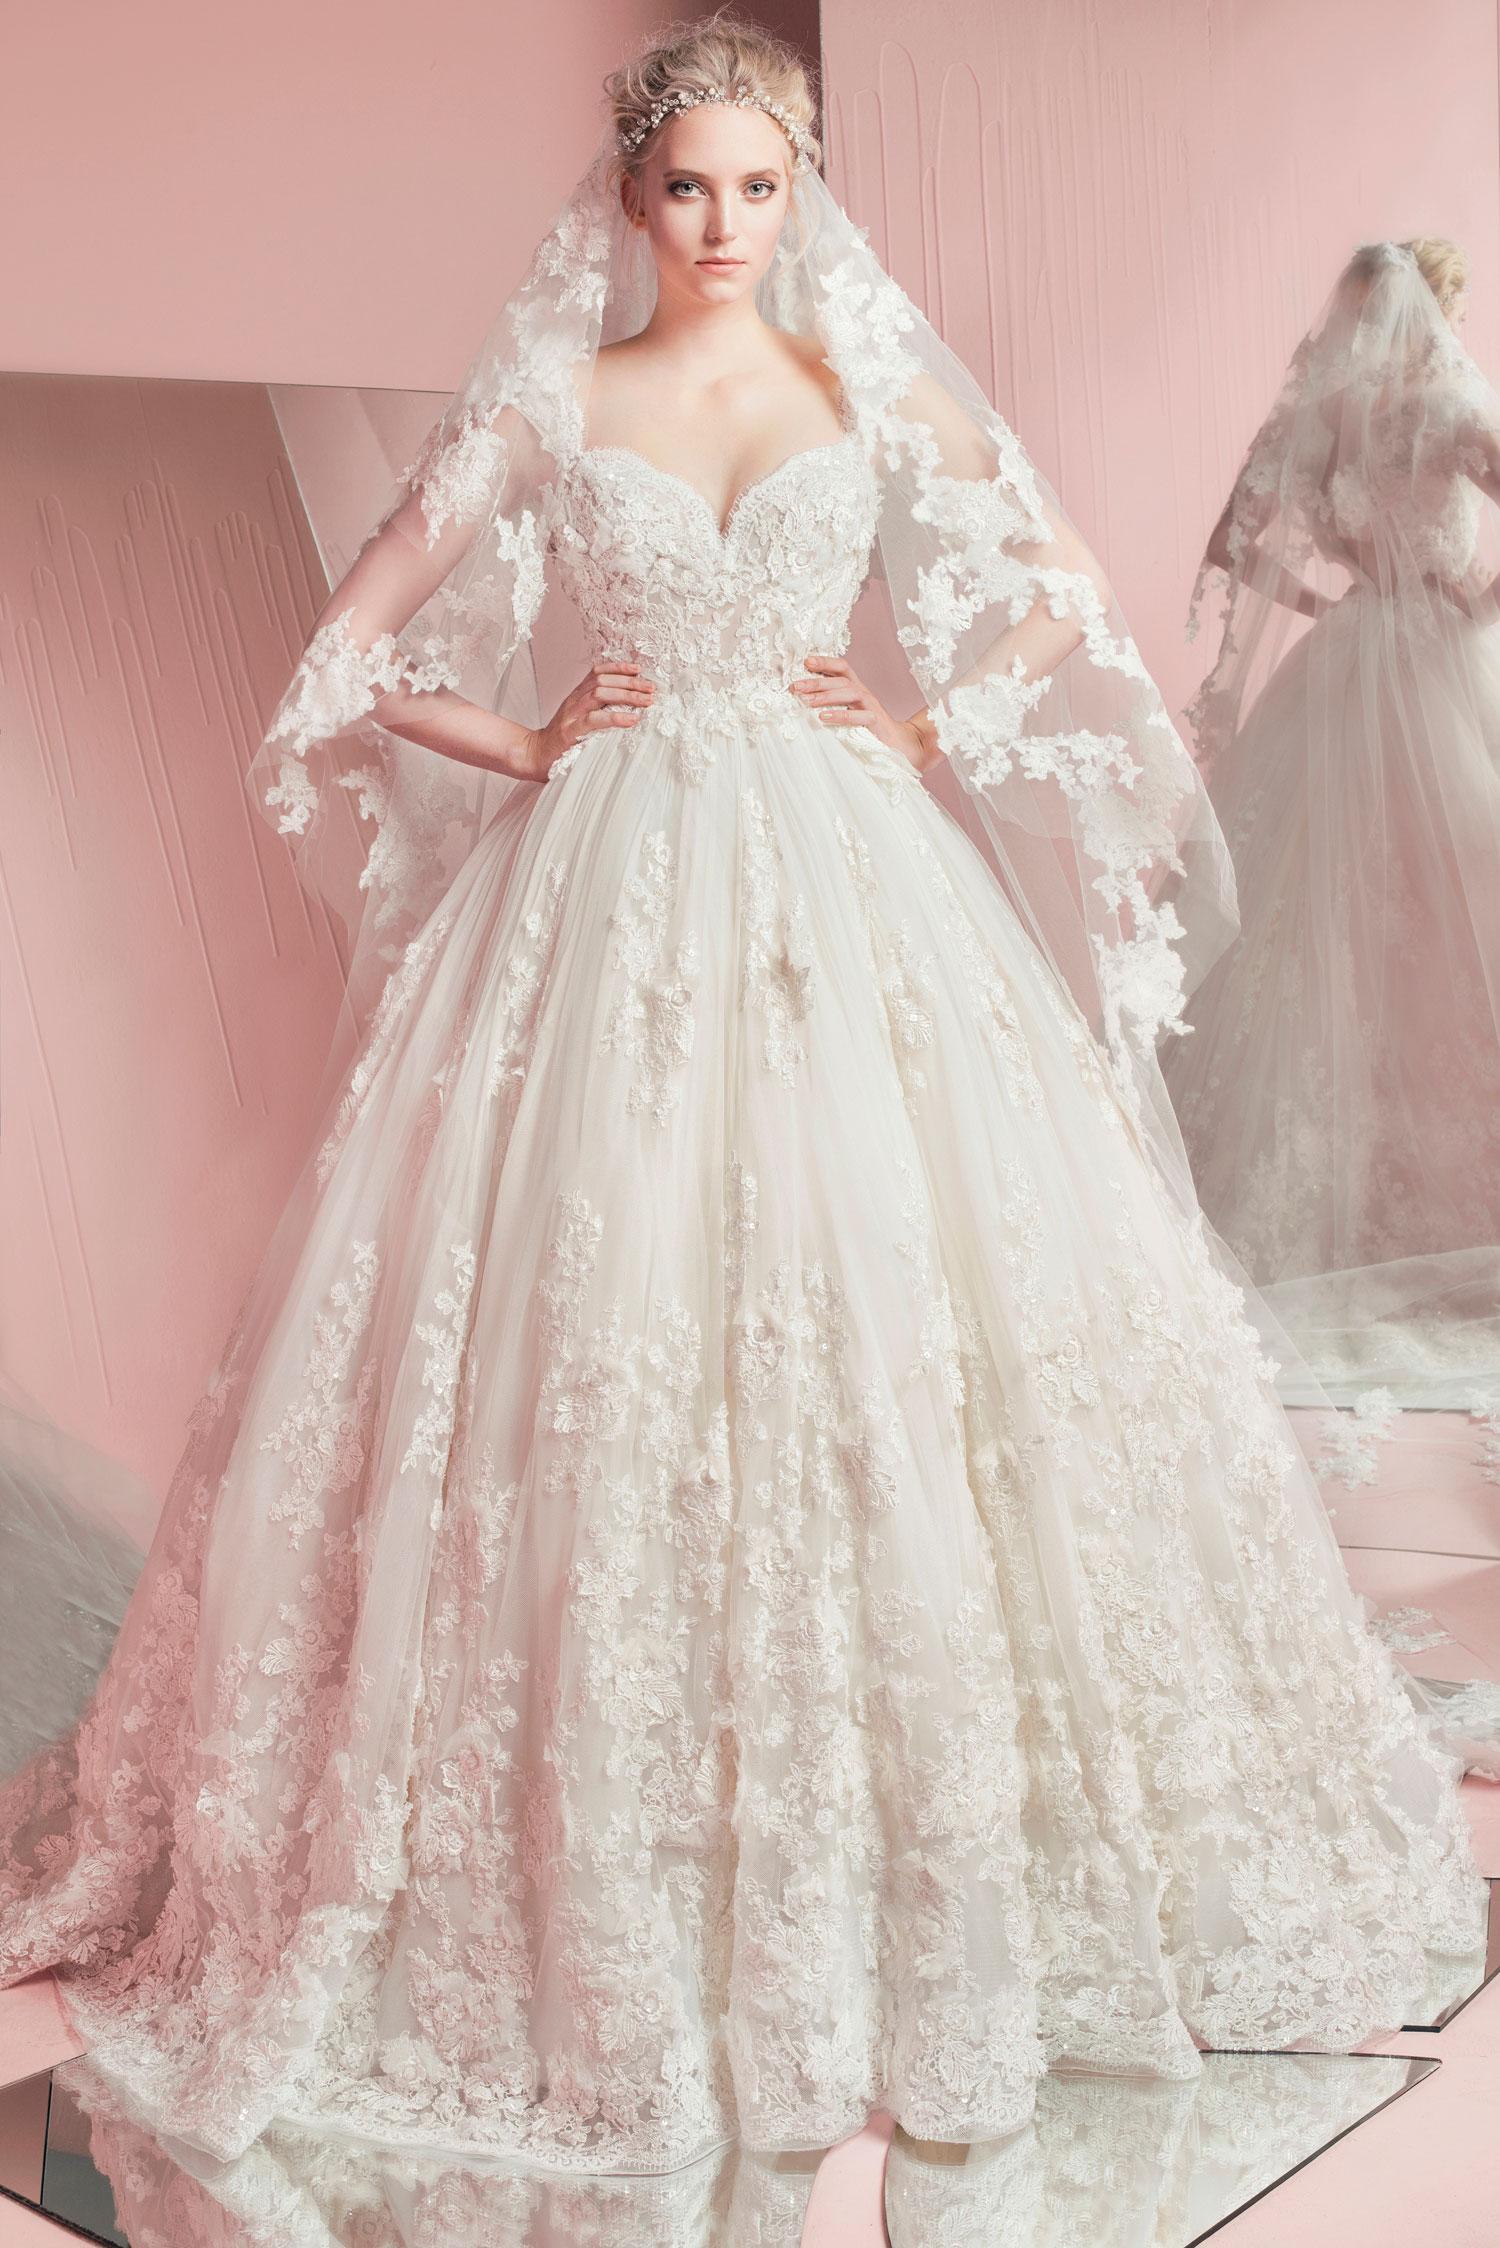 Elegant Lace Ball Gown Wedding Dresses Zuhair Murad 2016 Spring ...